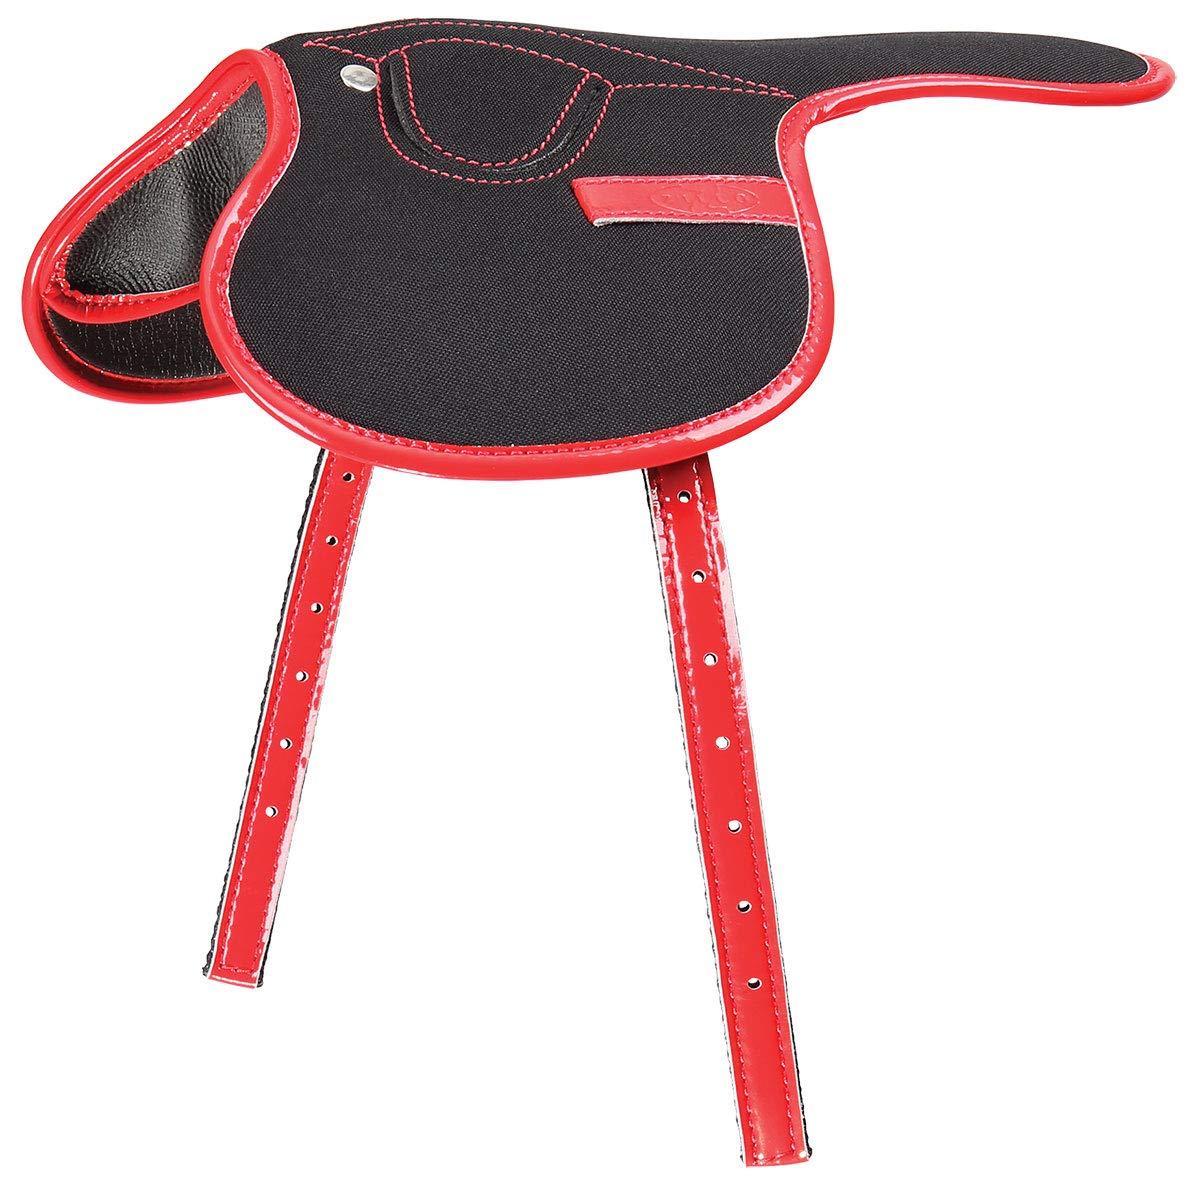 Black Red Zilco 185g Race Saddle (Black Red)